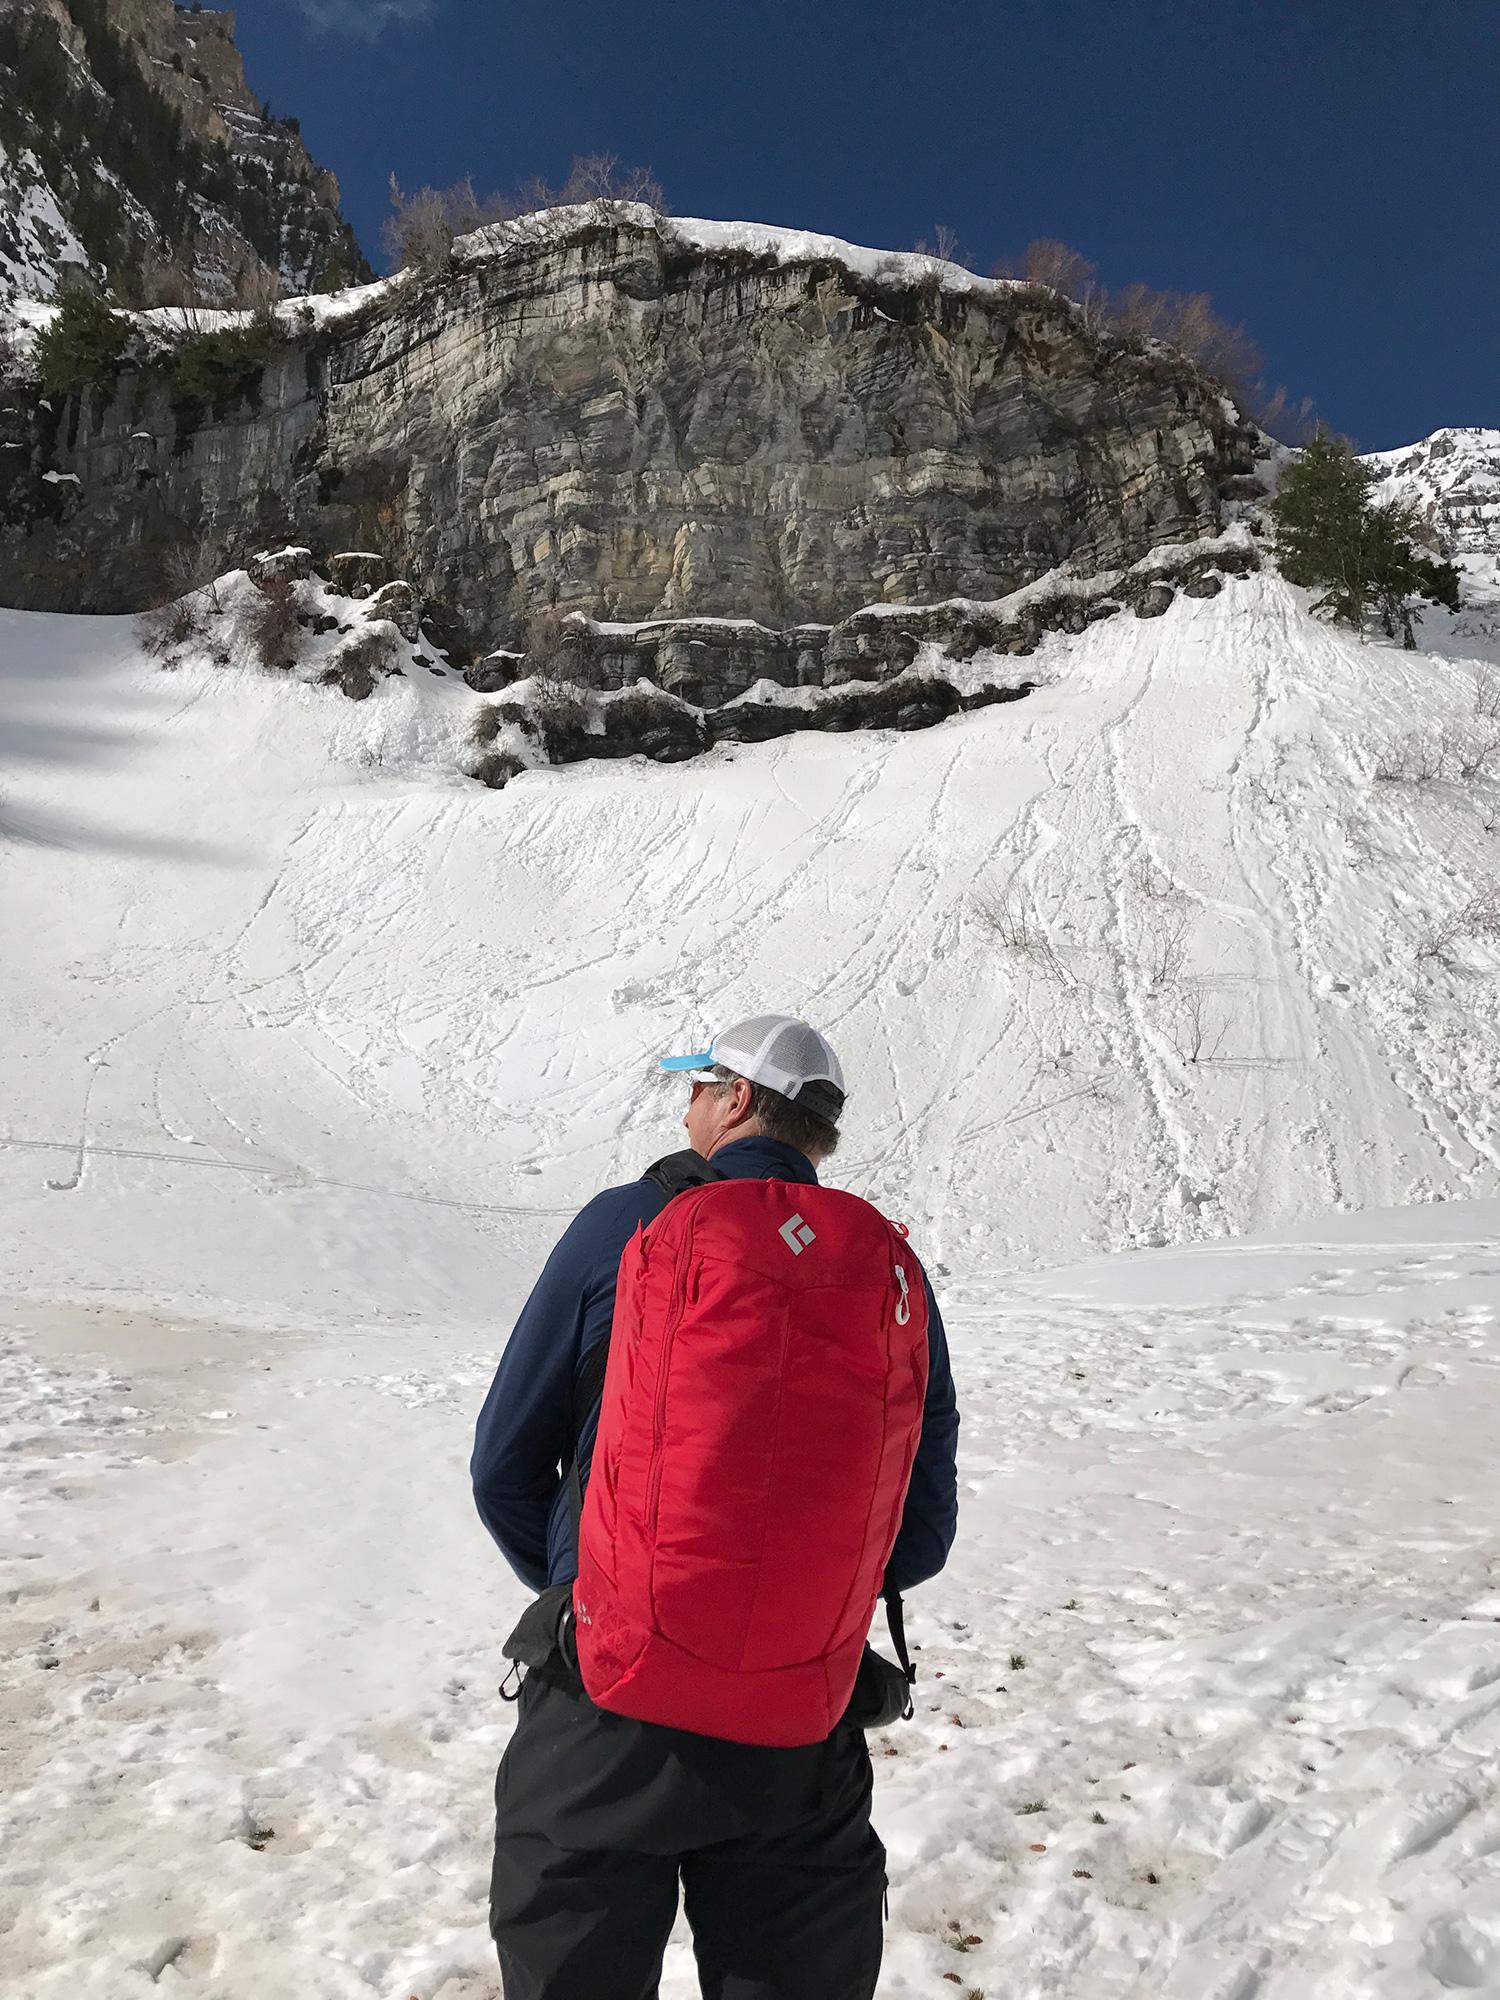 devin-stratton-150-foot-cliff-fall-utah.jpg